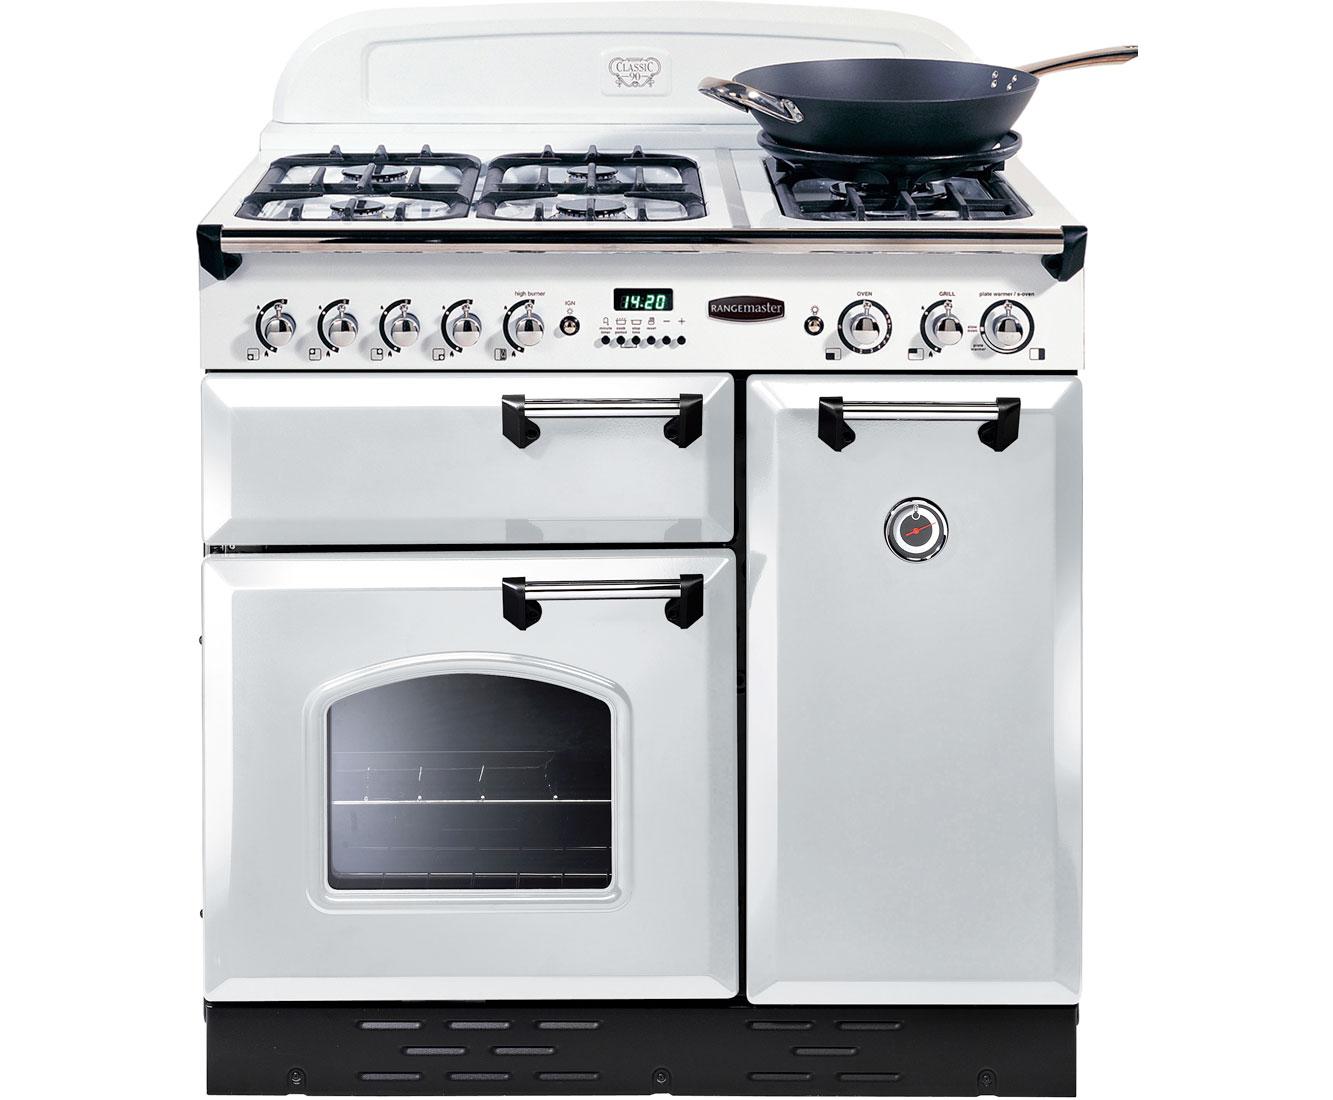 Rangemaster Classic CLBS90LPFWHC Free Standing Range Cooker in White  Chrome